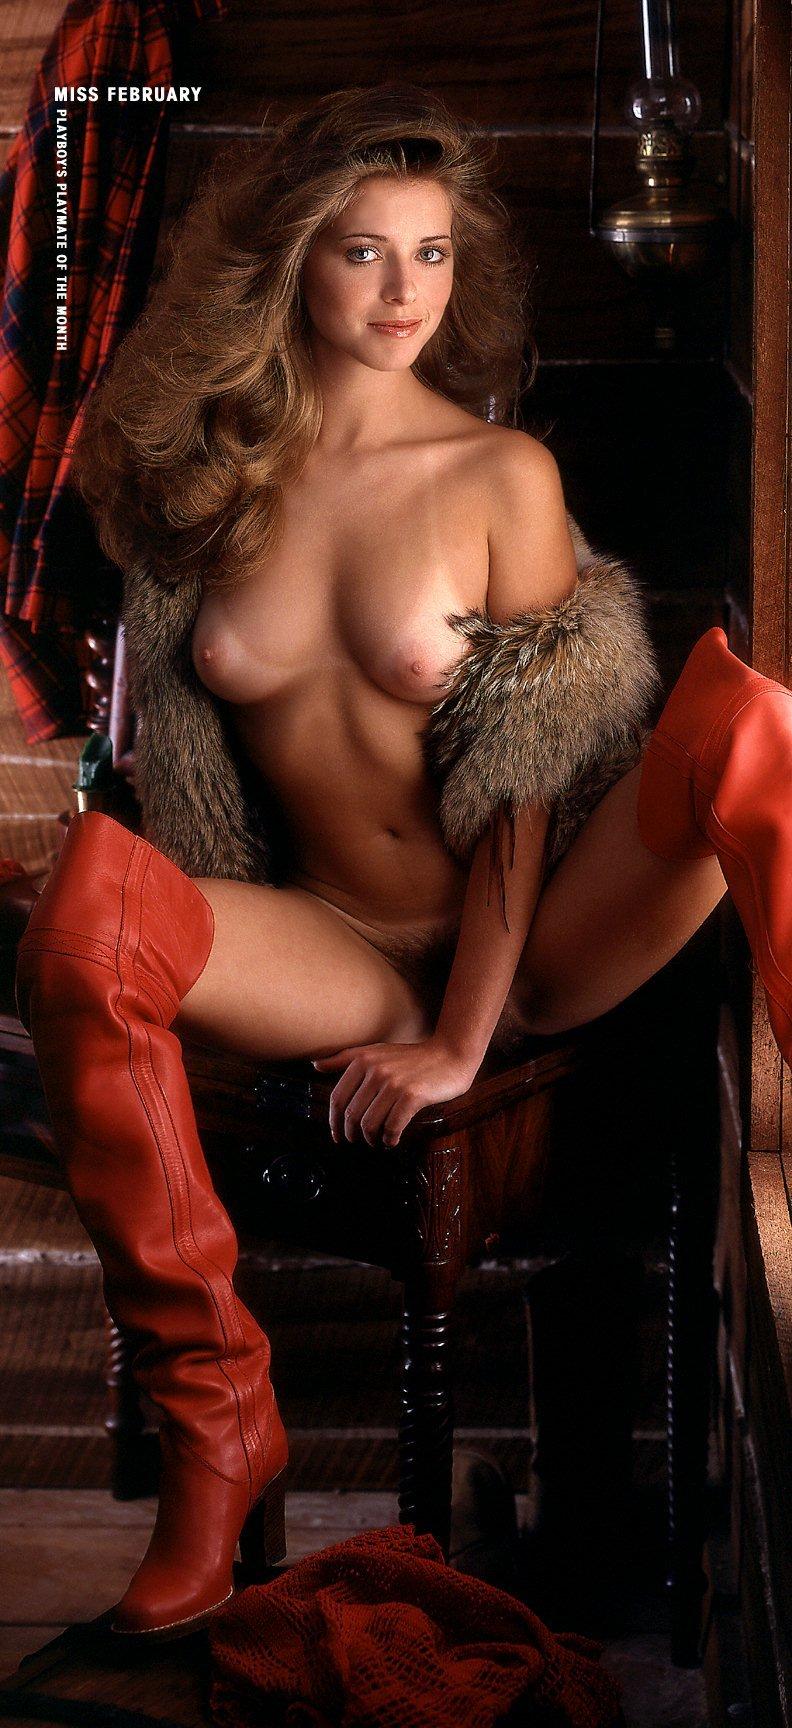 Angie Harmon Nuda angie harmon nude retro fuck picture.